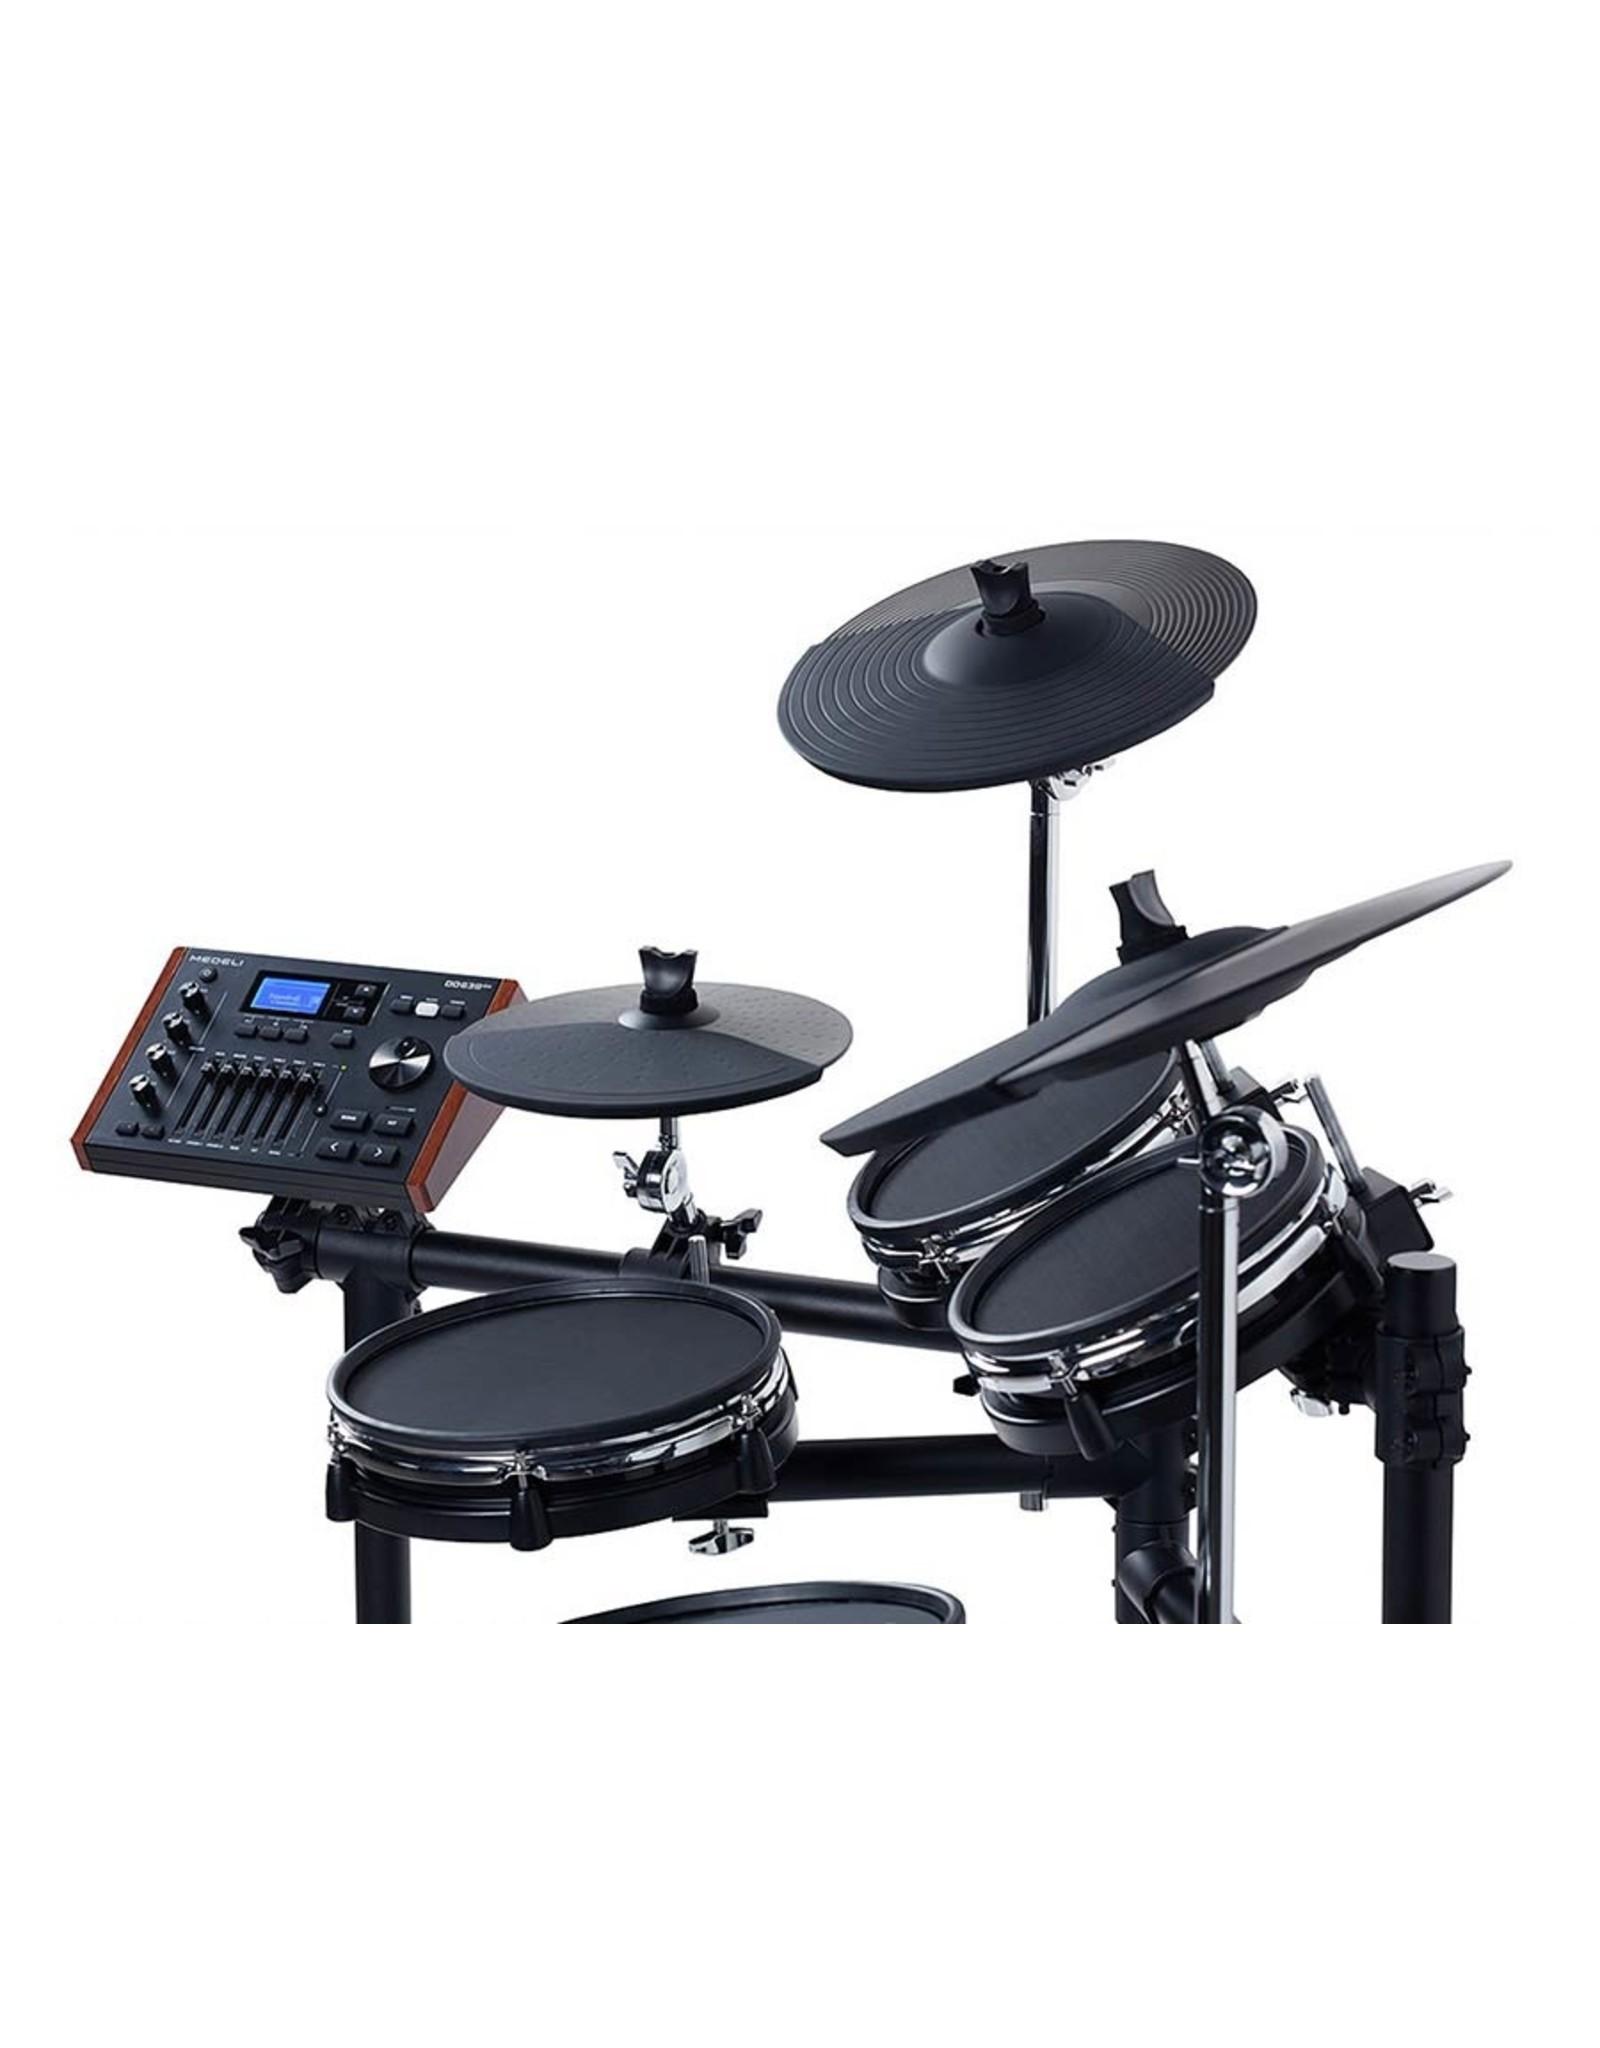 Medeli DD638DX| Medeli digital drum kit all dual zone with mesh heads 10S-8-8-10-8K